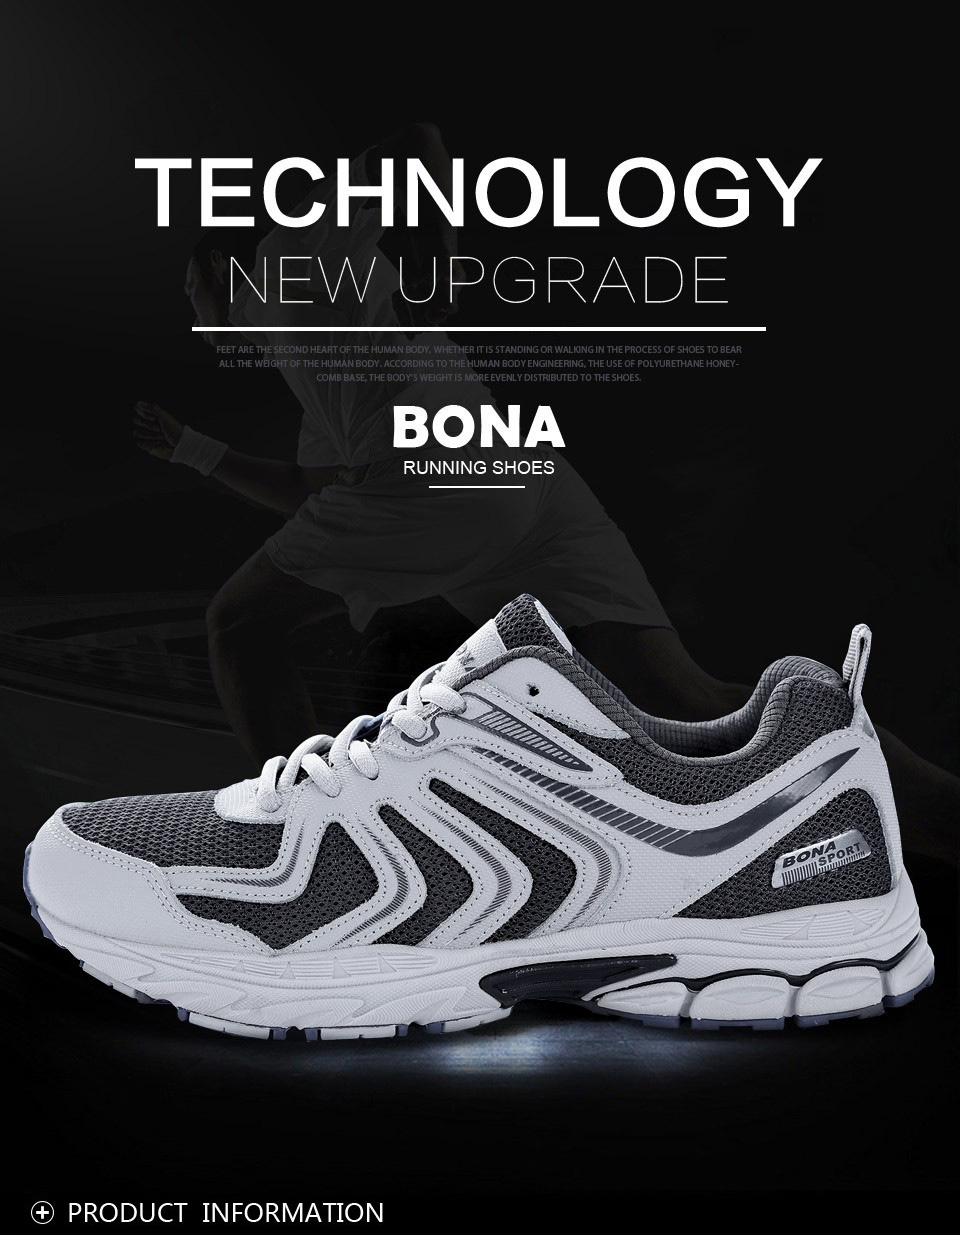 H824c1661420d44d89b7e5ff2015d8d39S BONA New Fashion Style Men shoes Casual Shoes Men Loafers Men Outdoor Sneakers Shoes Mesh Men Flats Free Shipping